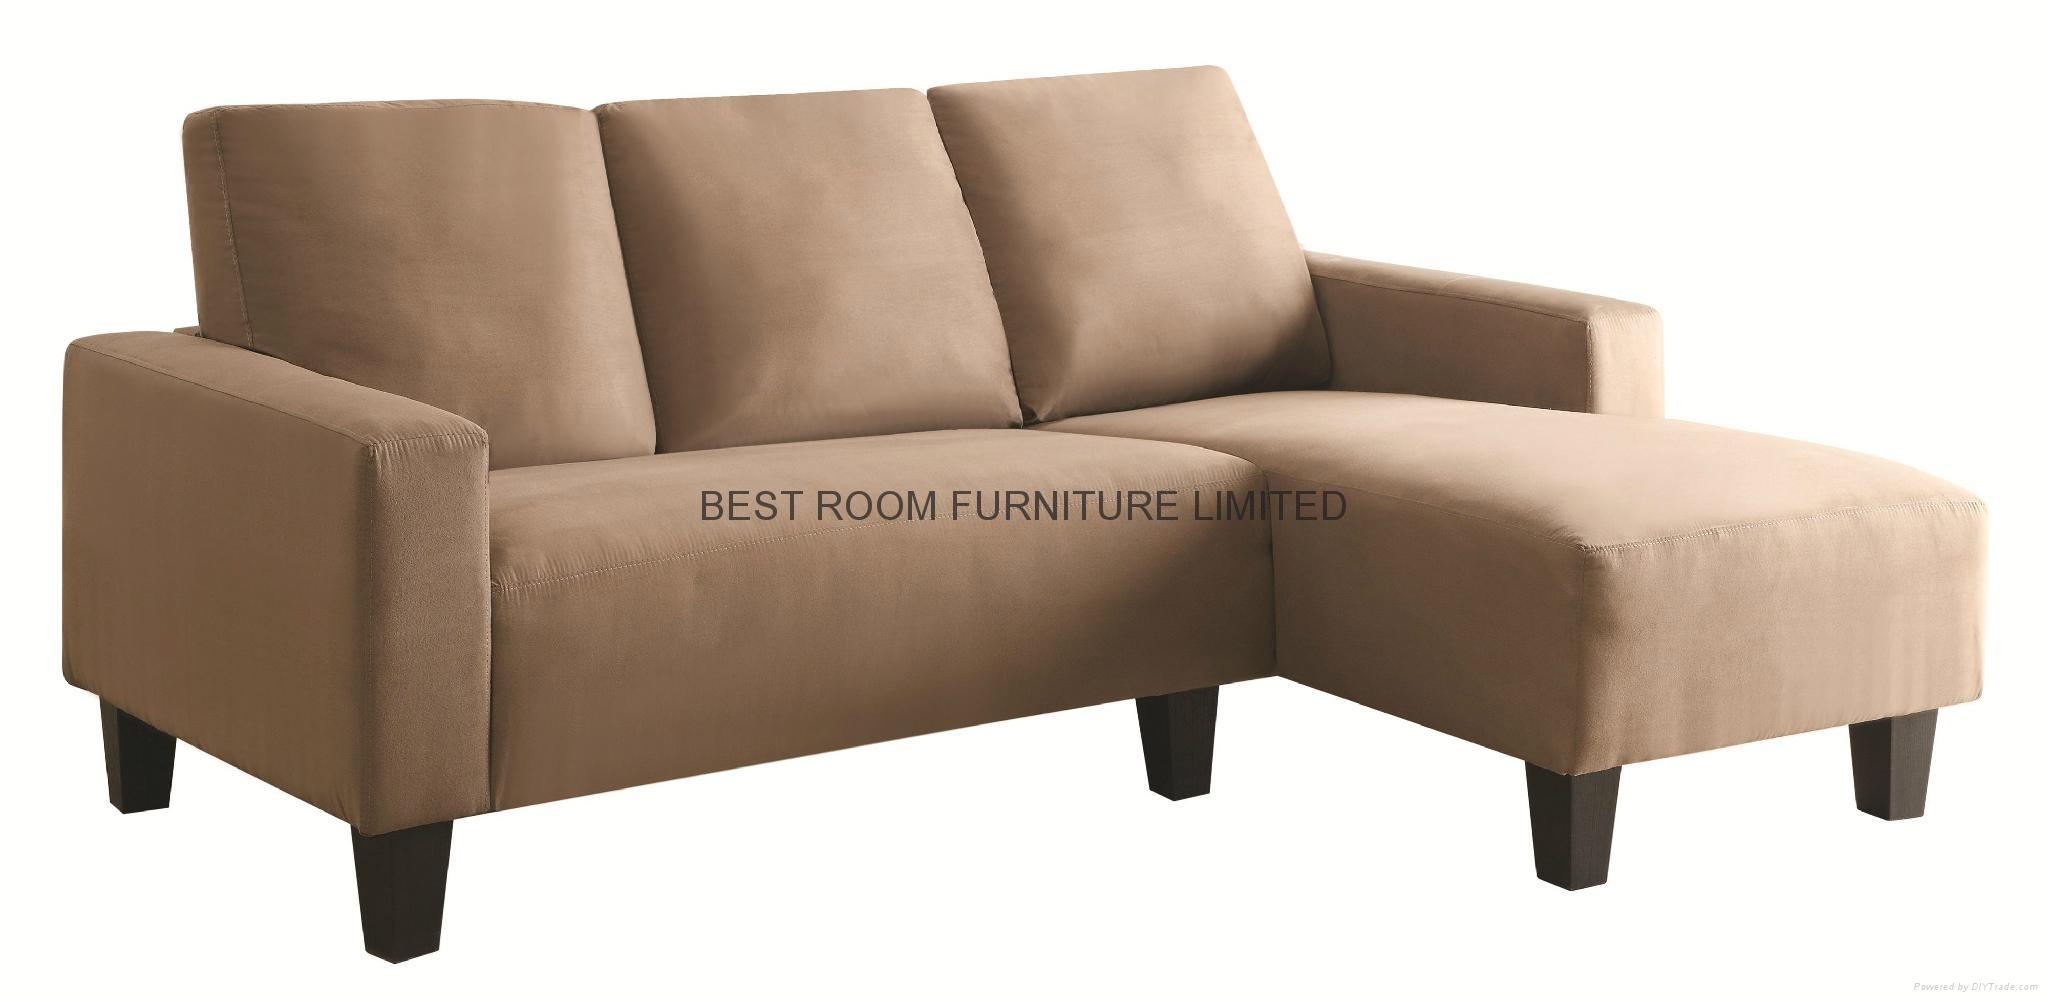 promotion cheap corner sofa leather corner sofa fabric sofa 1